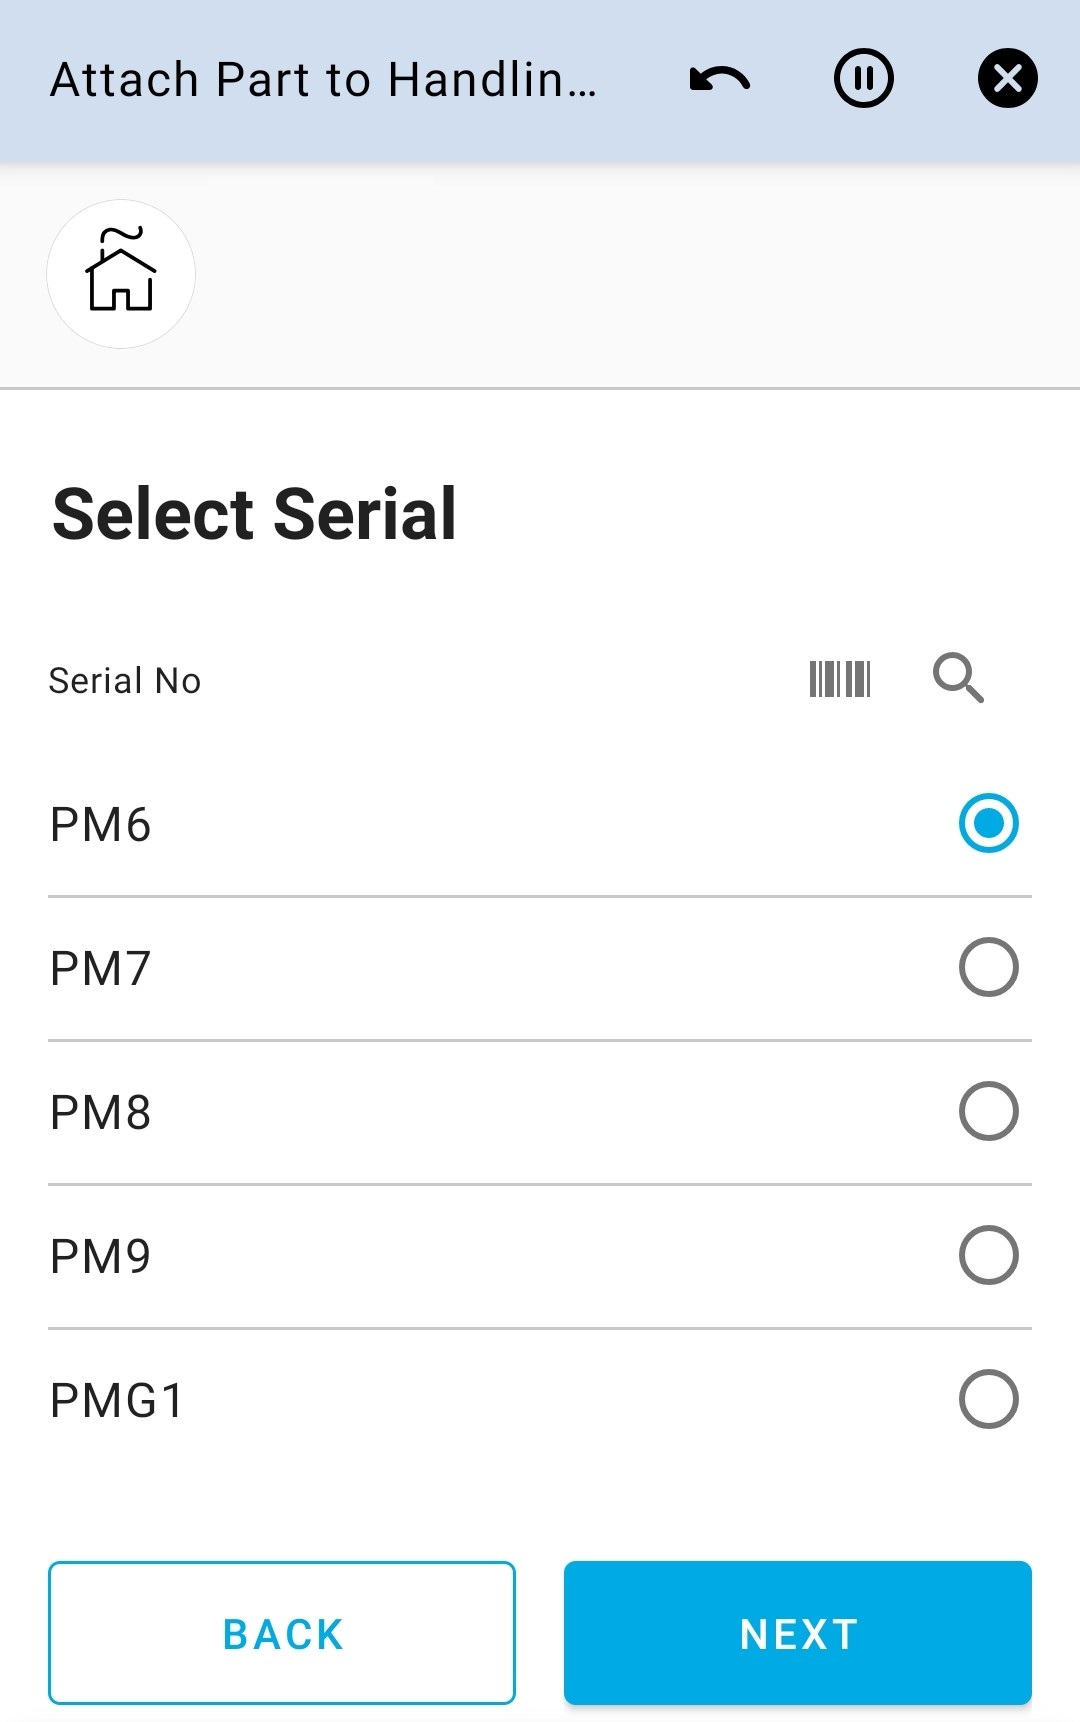 Select Serial No